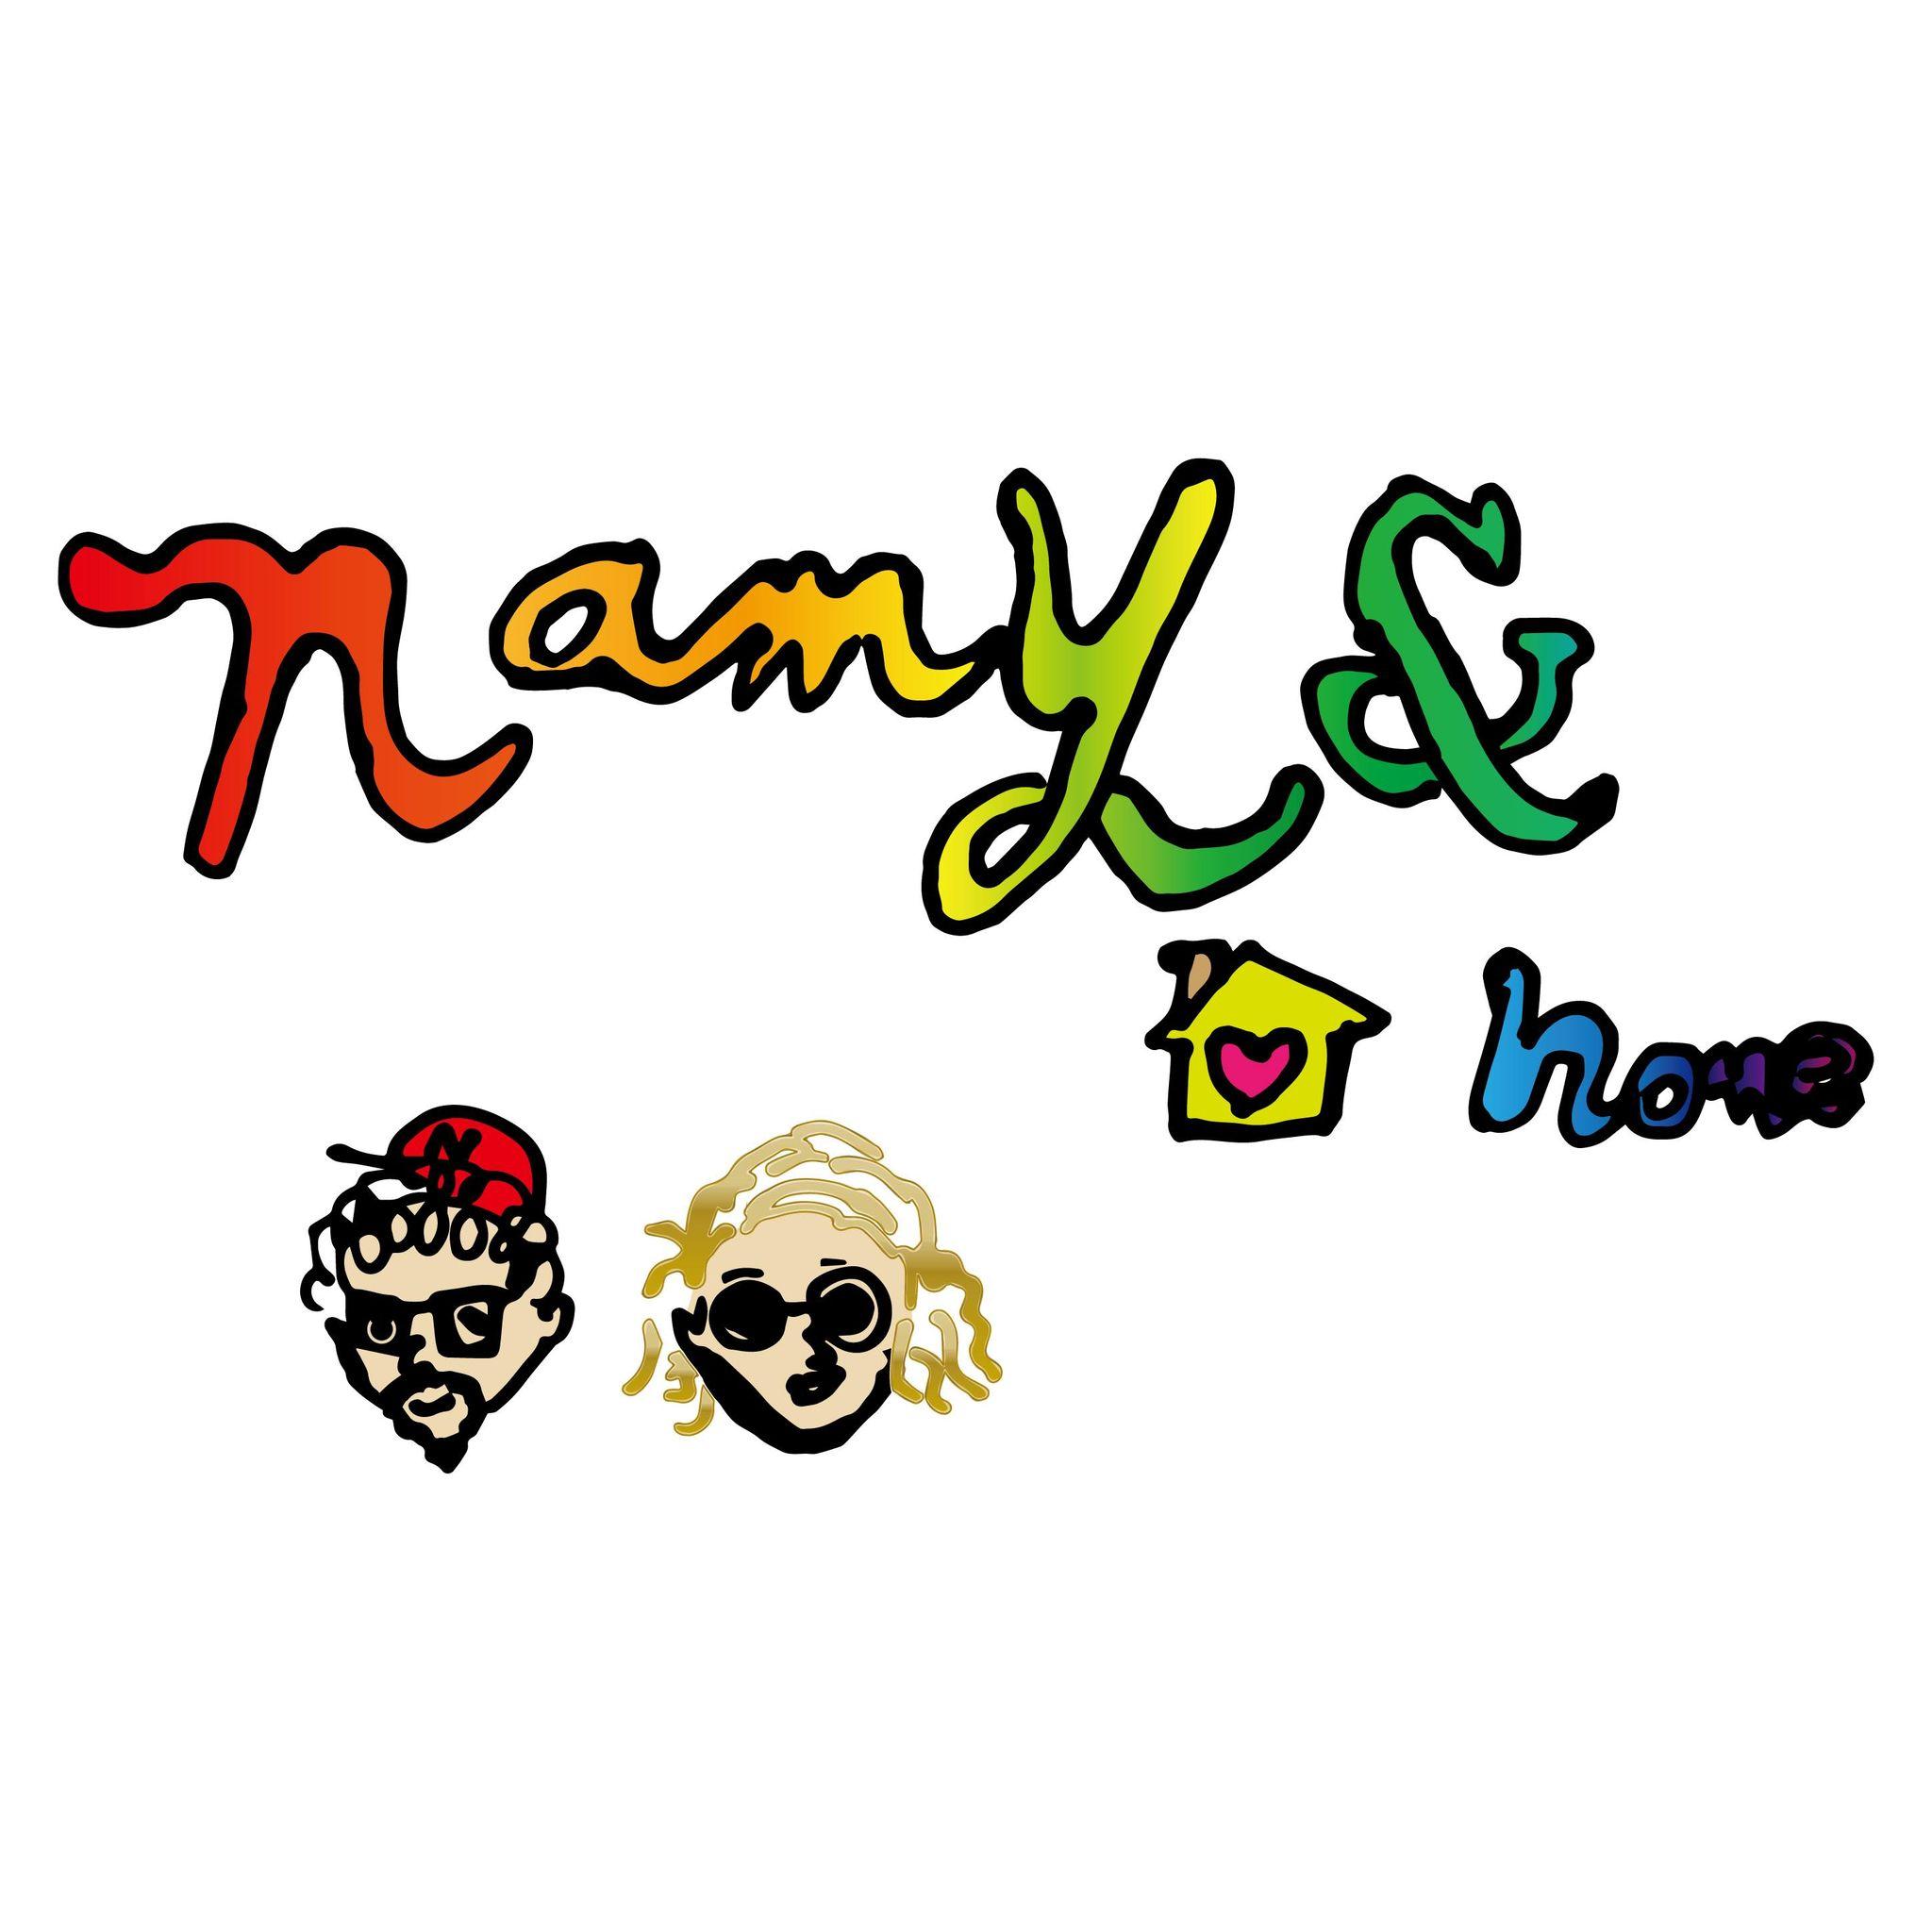 【新番組紹介!】Namy& home